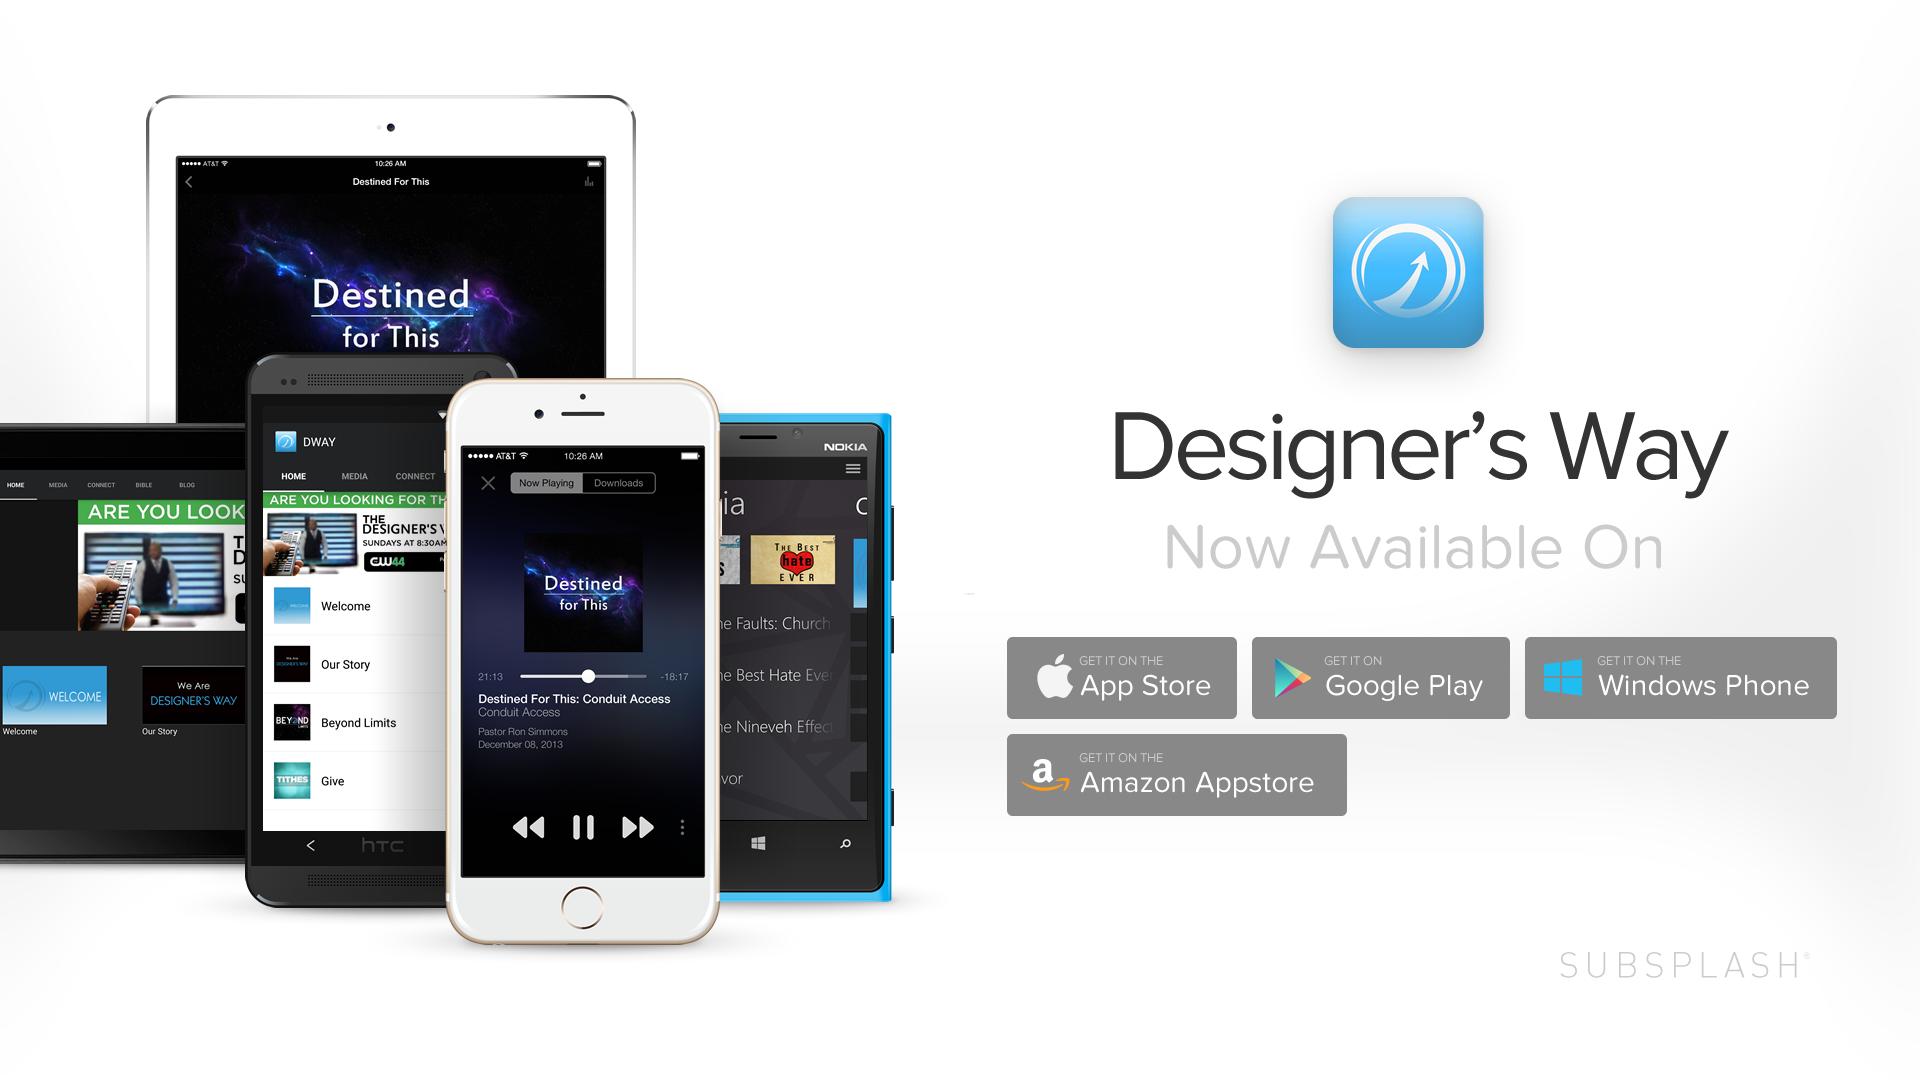 Designers Way - Designer home phones